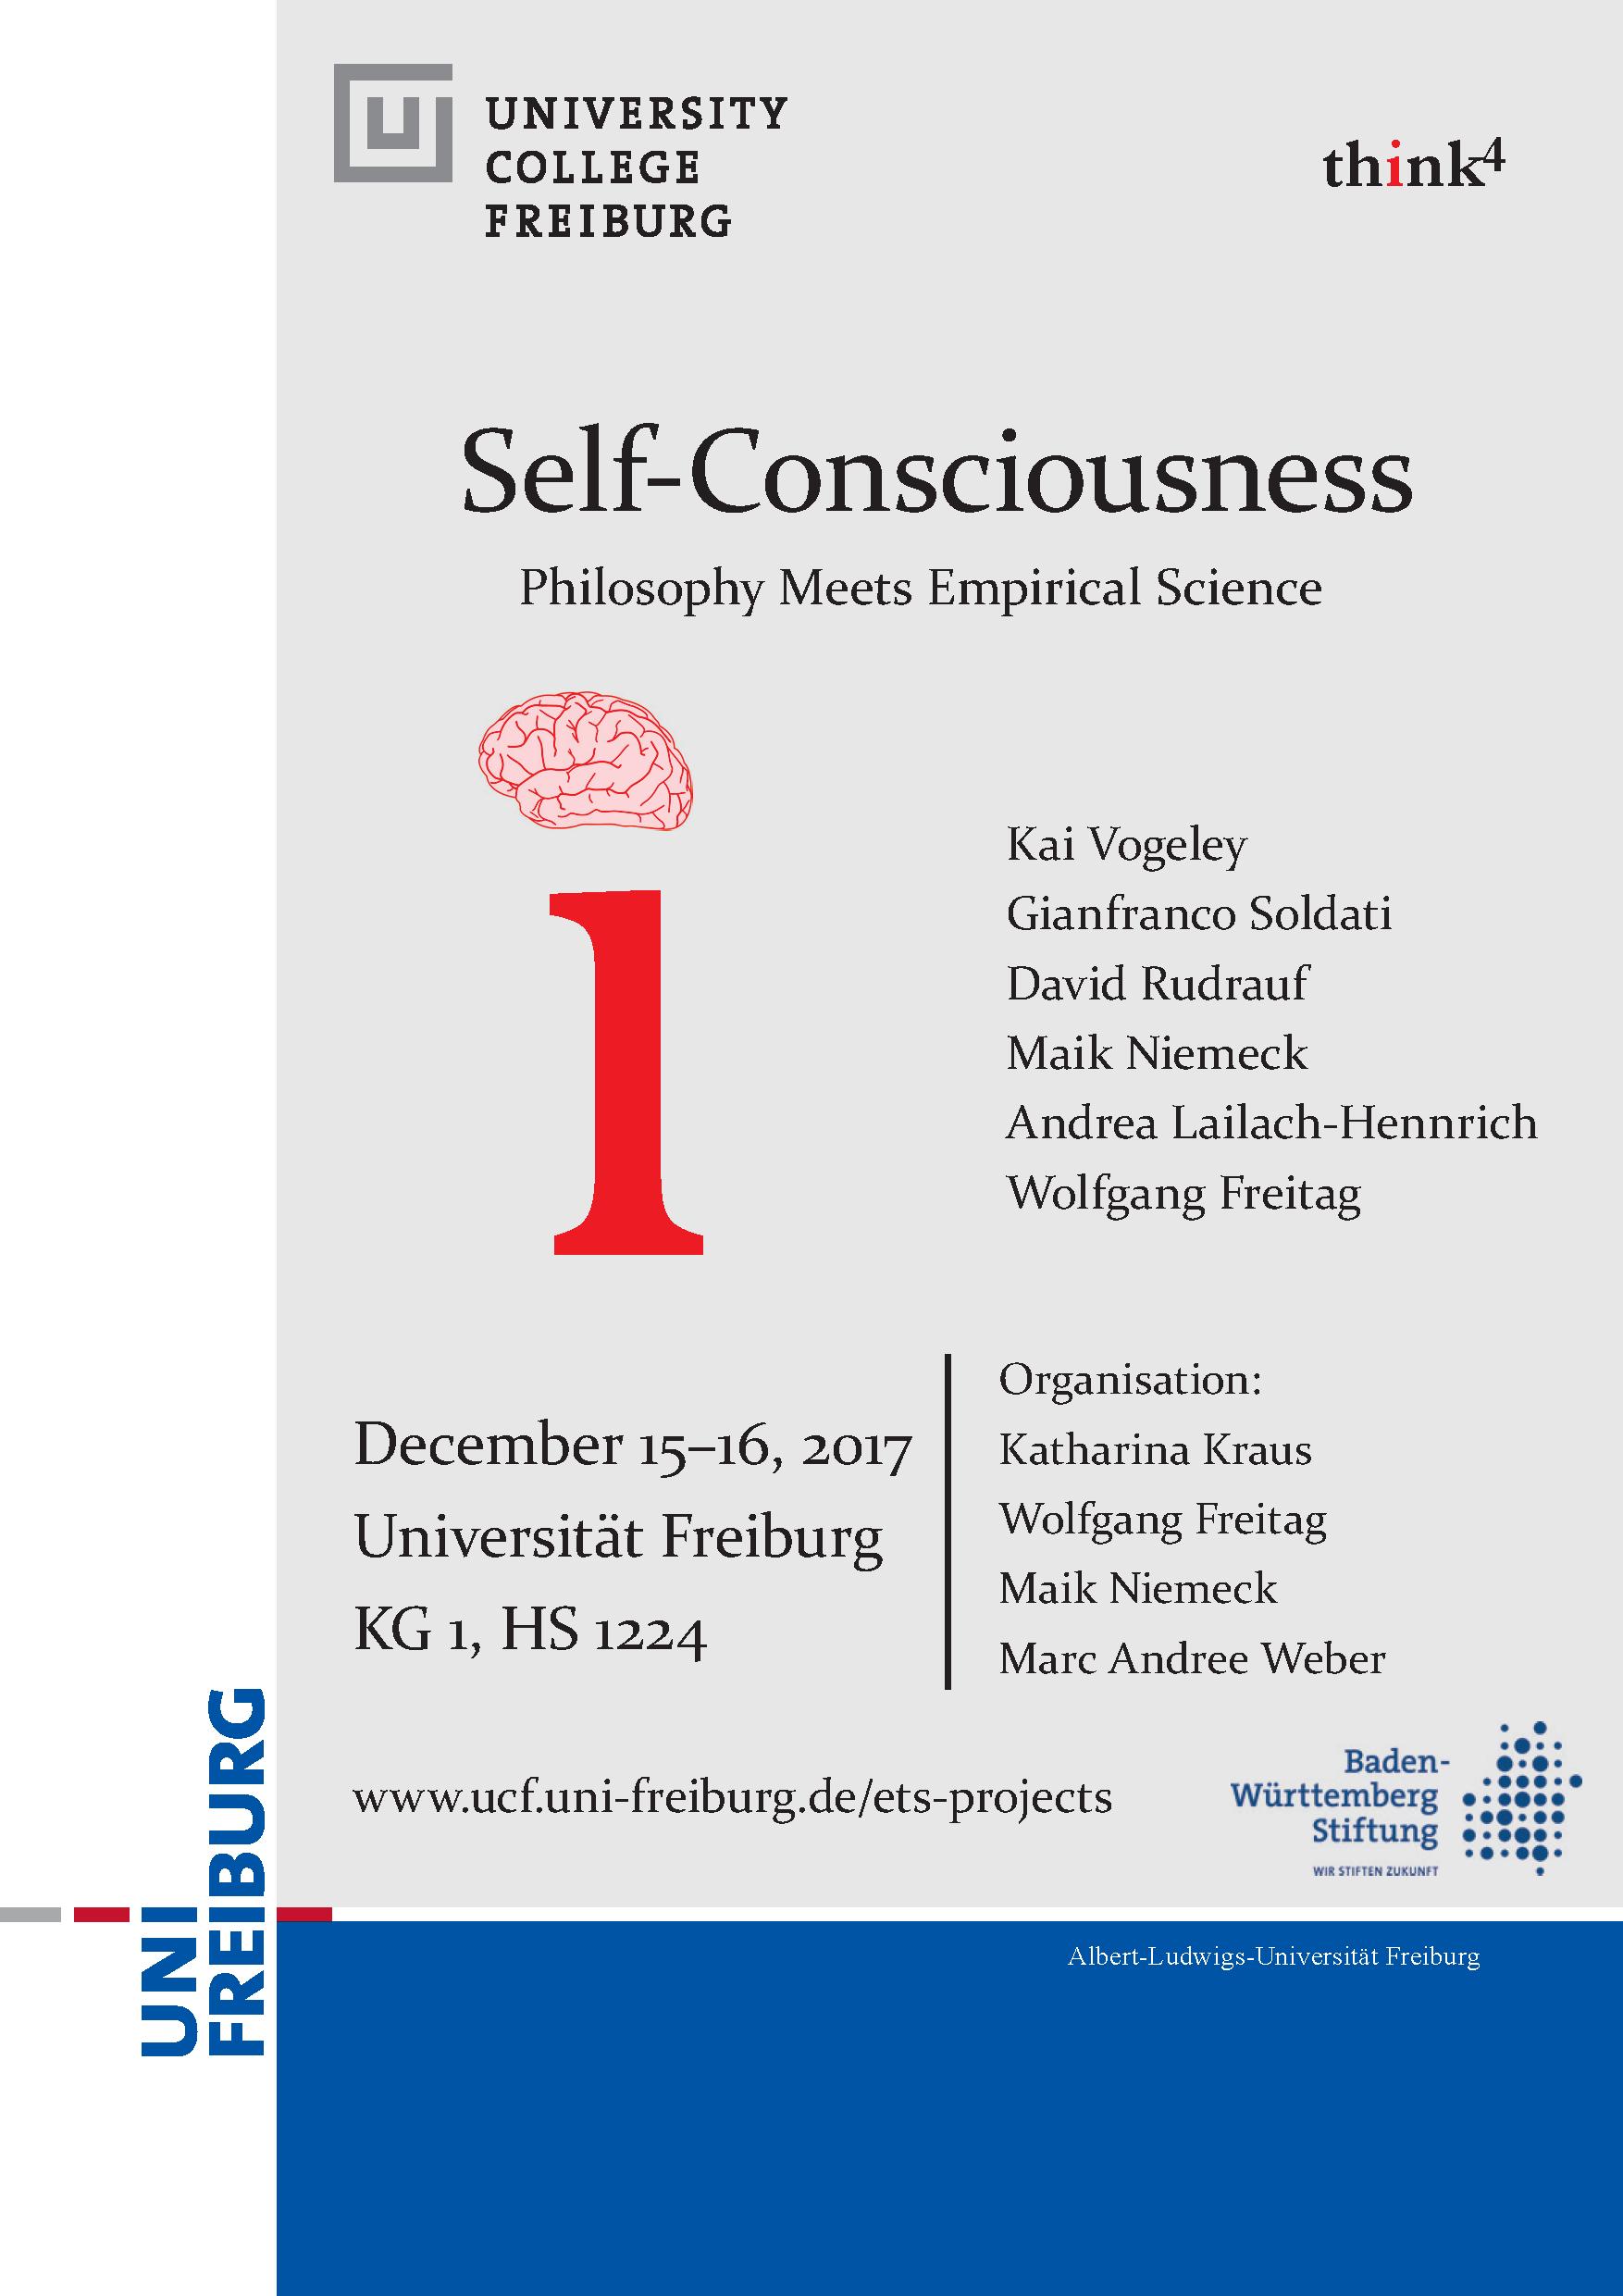 Workshop Self-Consciousness